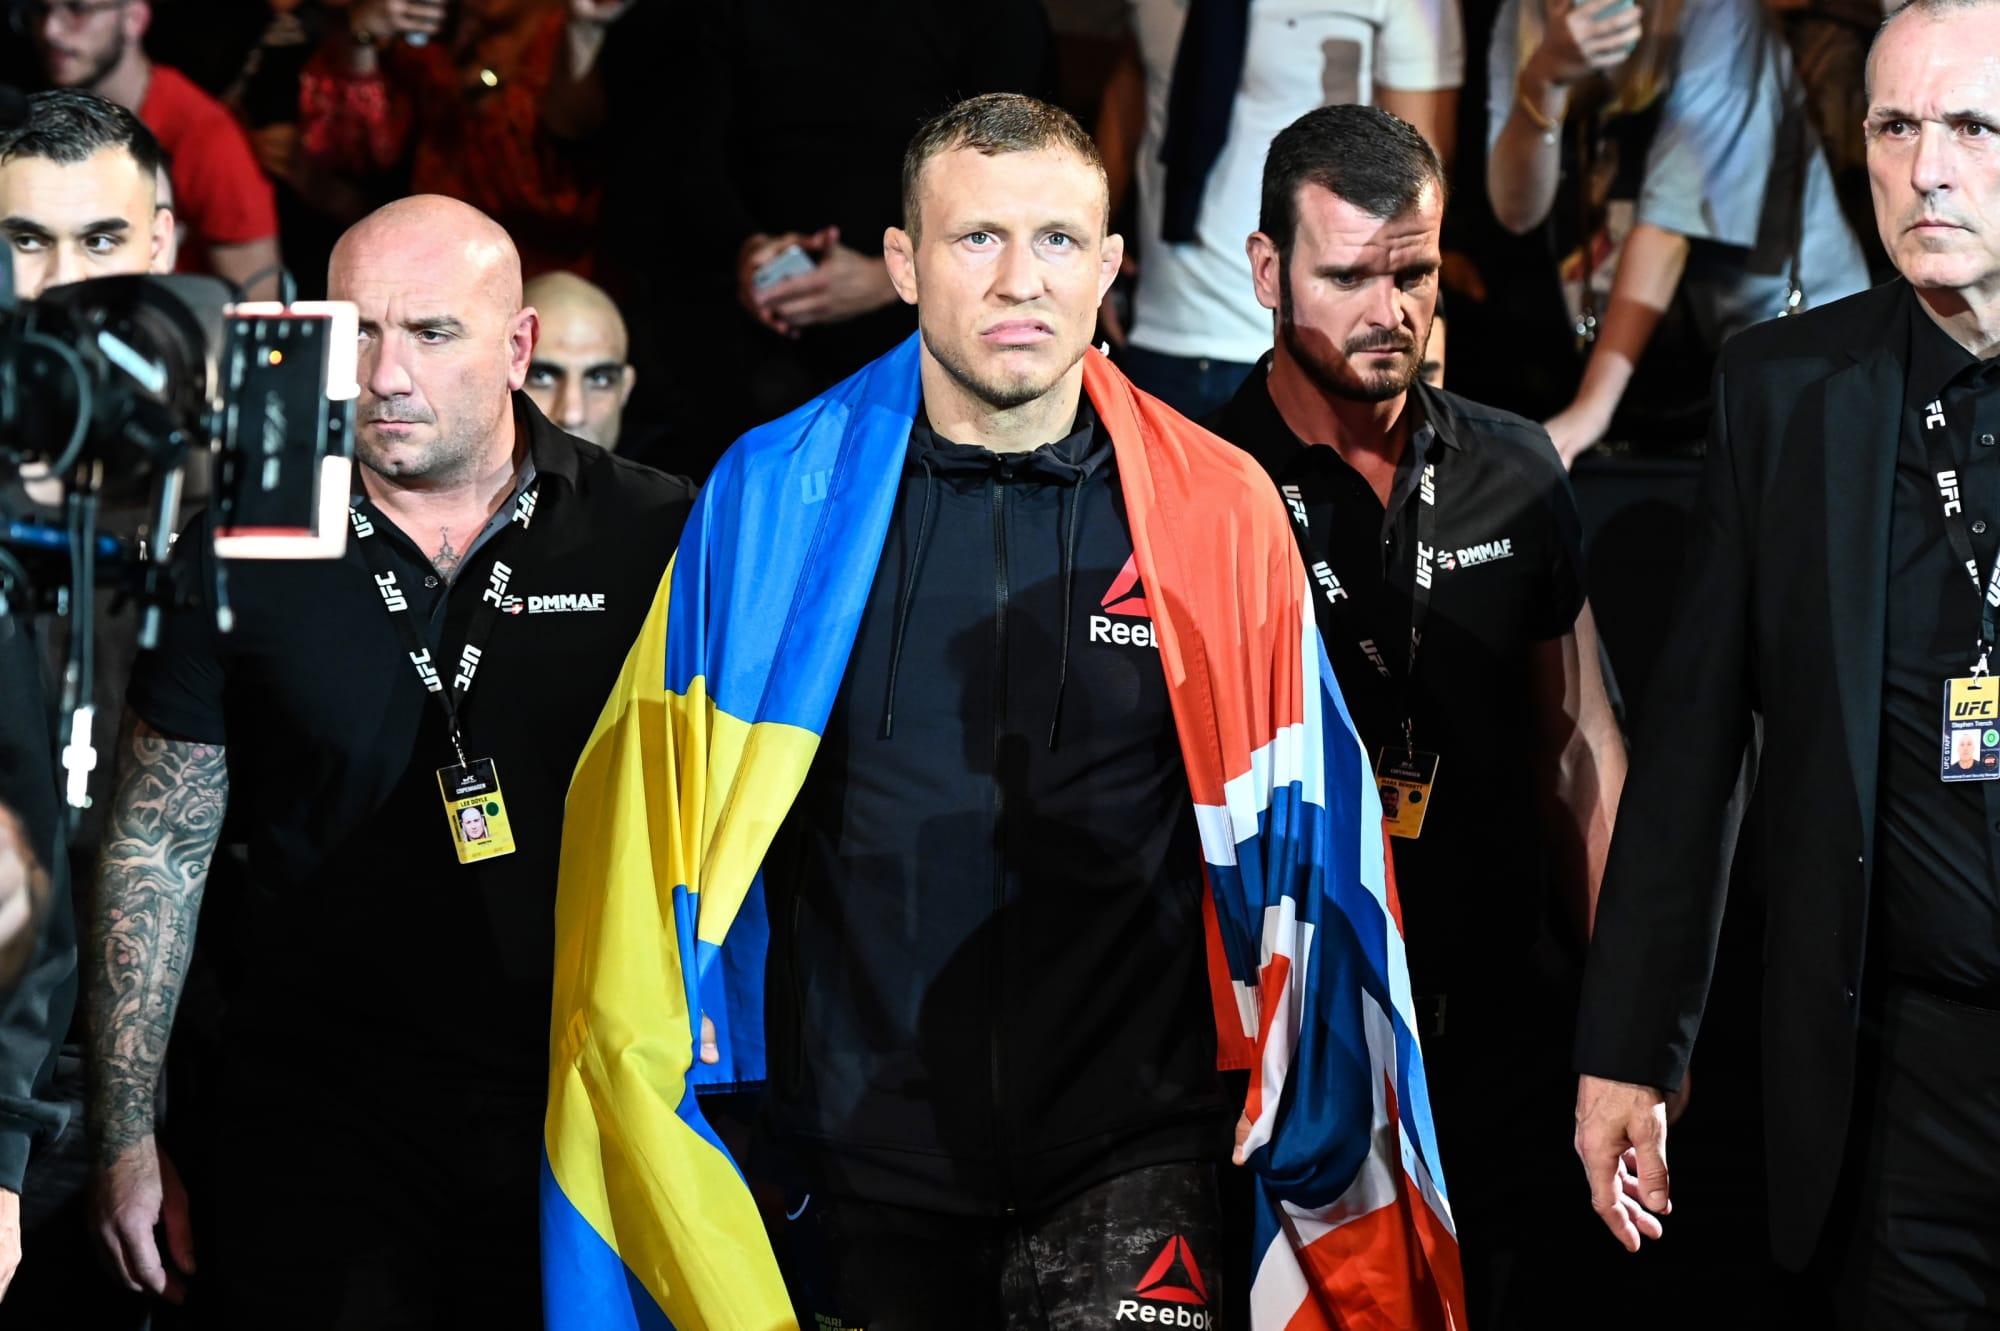 UFC Vegas 16: Jack Hermansson vs. Marvin Vettori preview and predictions